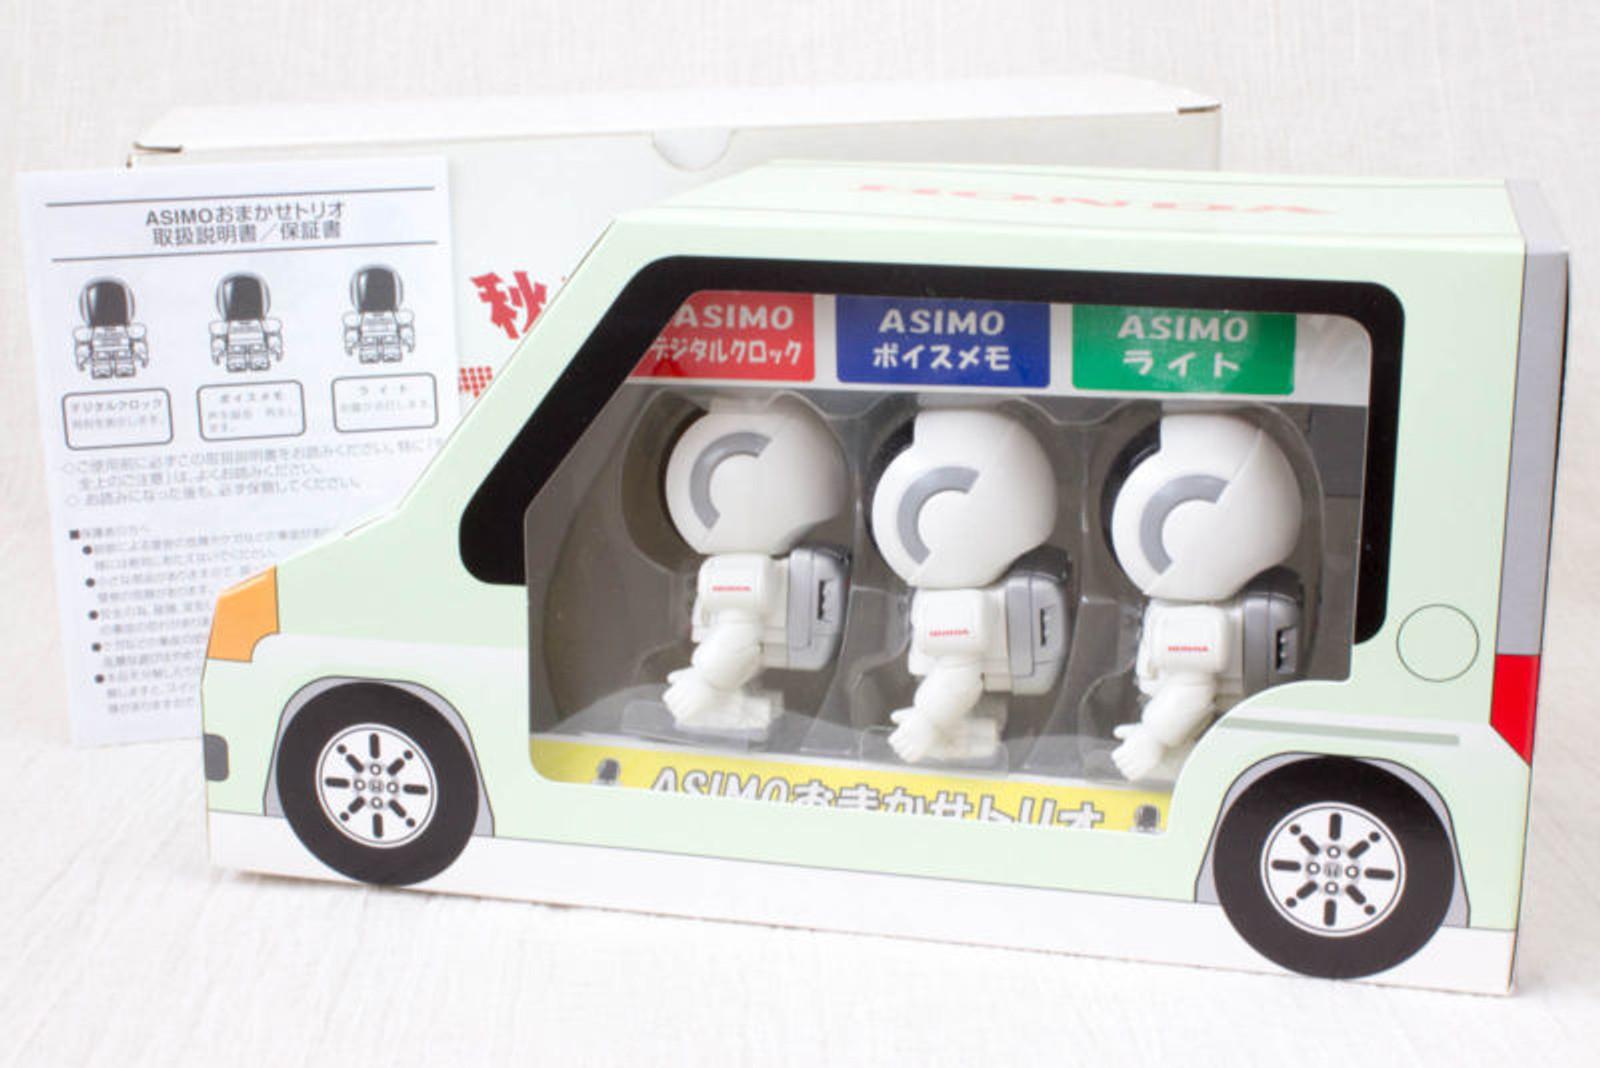 HONDA Asimo Trio Mascot Figure Type LED Light & Digital Clock & Voice Memo JAPAN